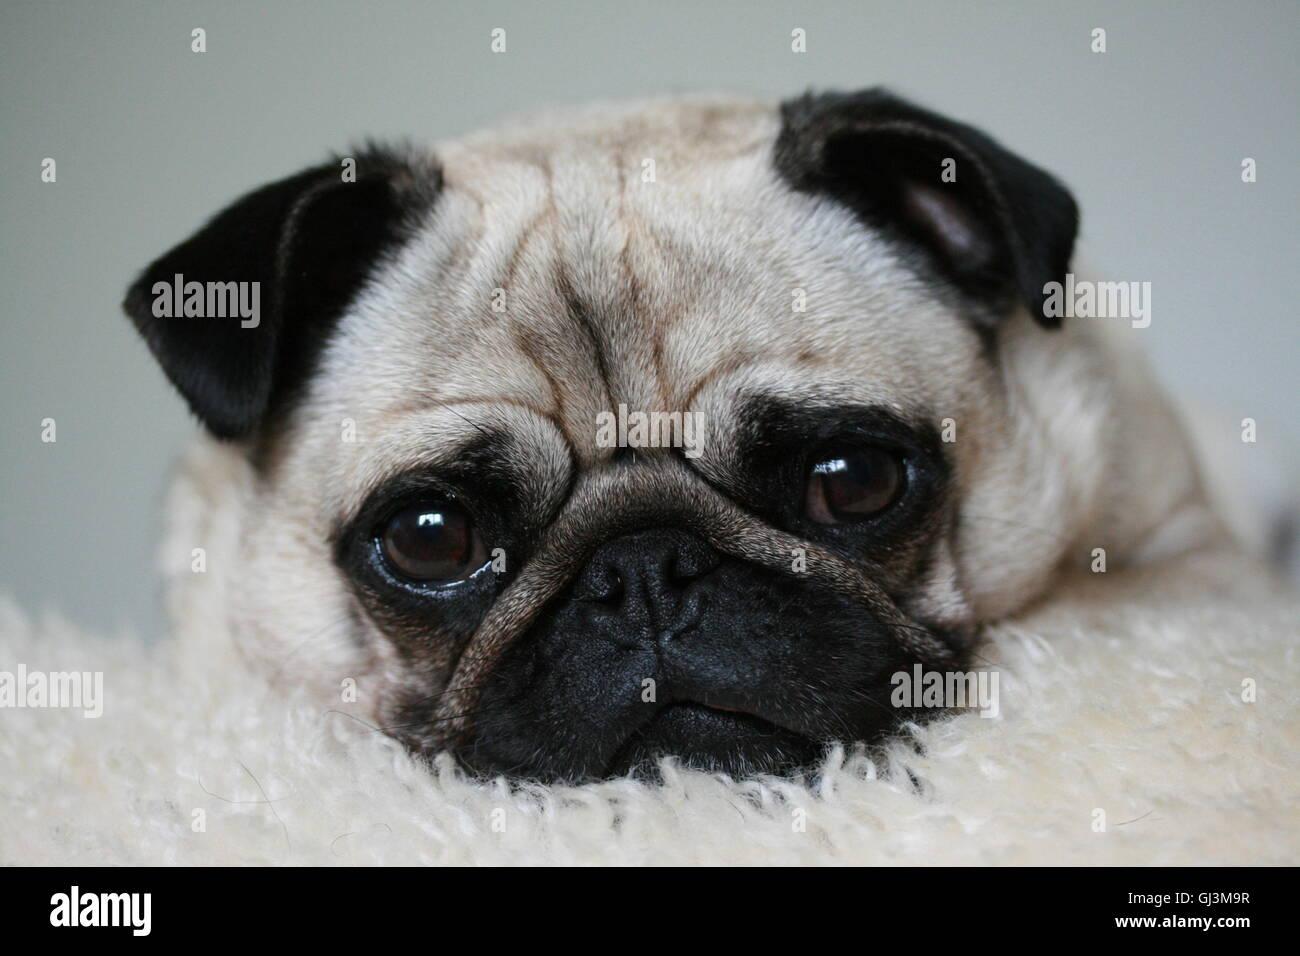 Fawn pug on a sheepskin rug - Stock Image